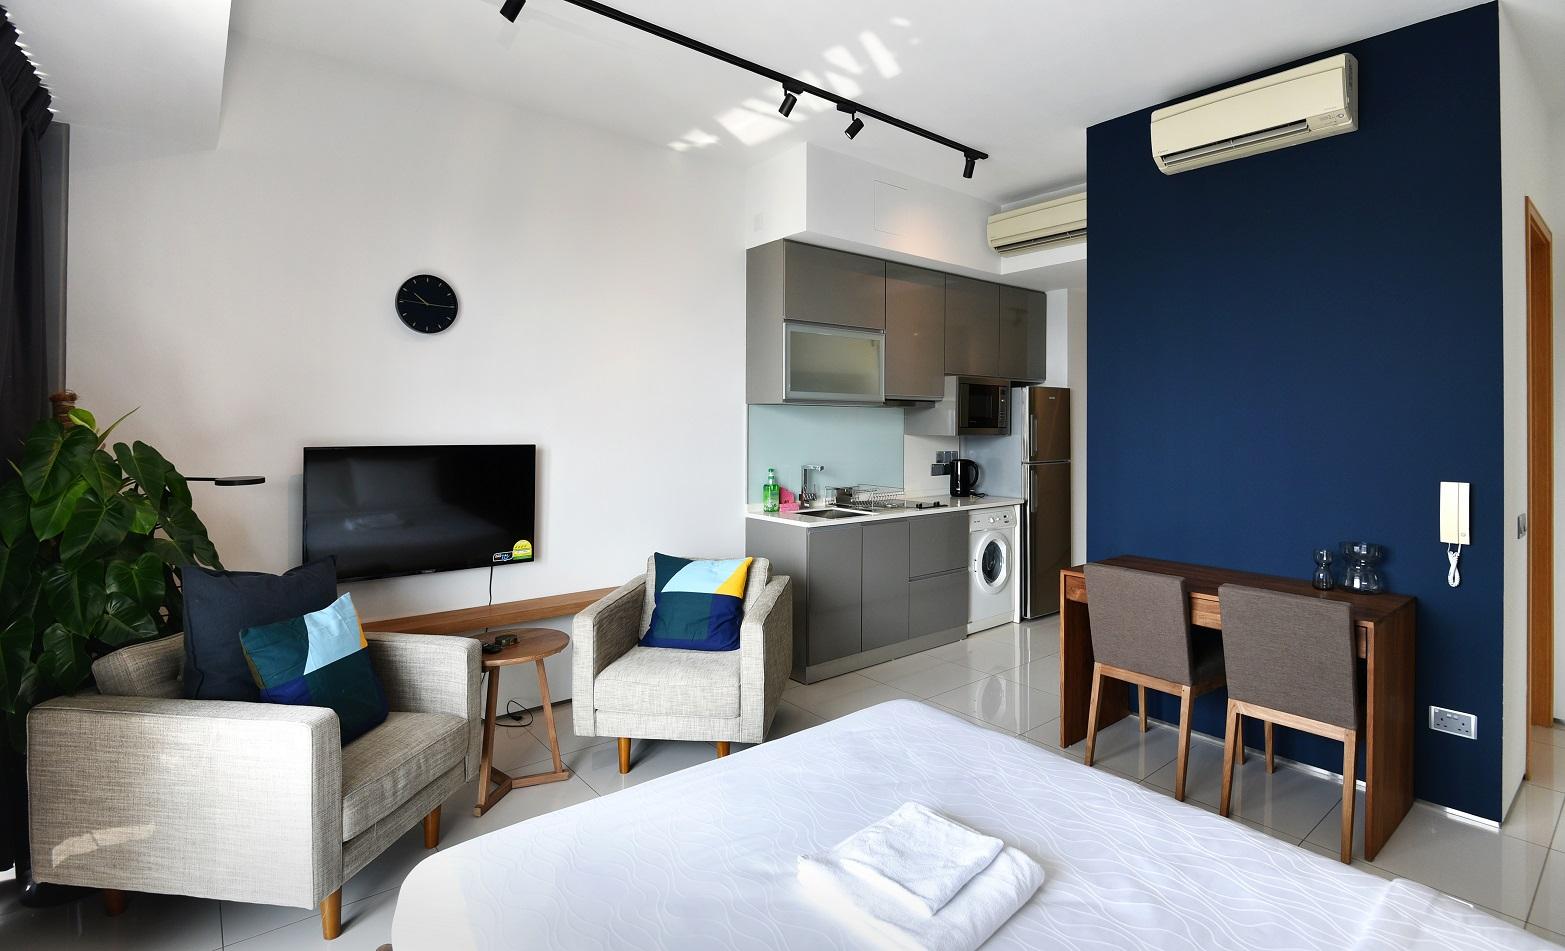 A 506 sq ft studio apartment at Hmlet@Lumiere (Credit: Albert Chua/EdgeProp Singapore) - EDGEPROP SINGAPORE